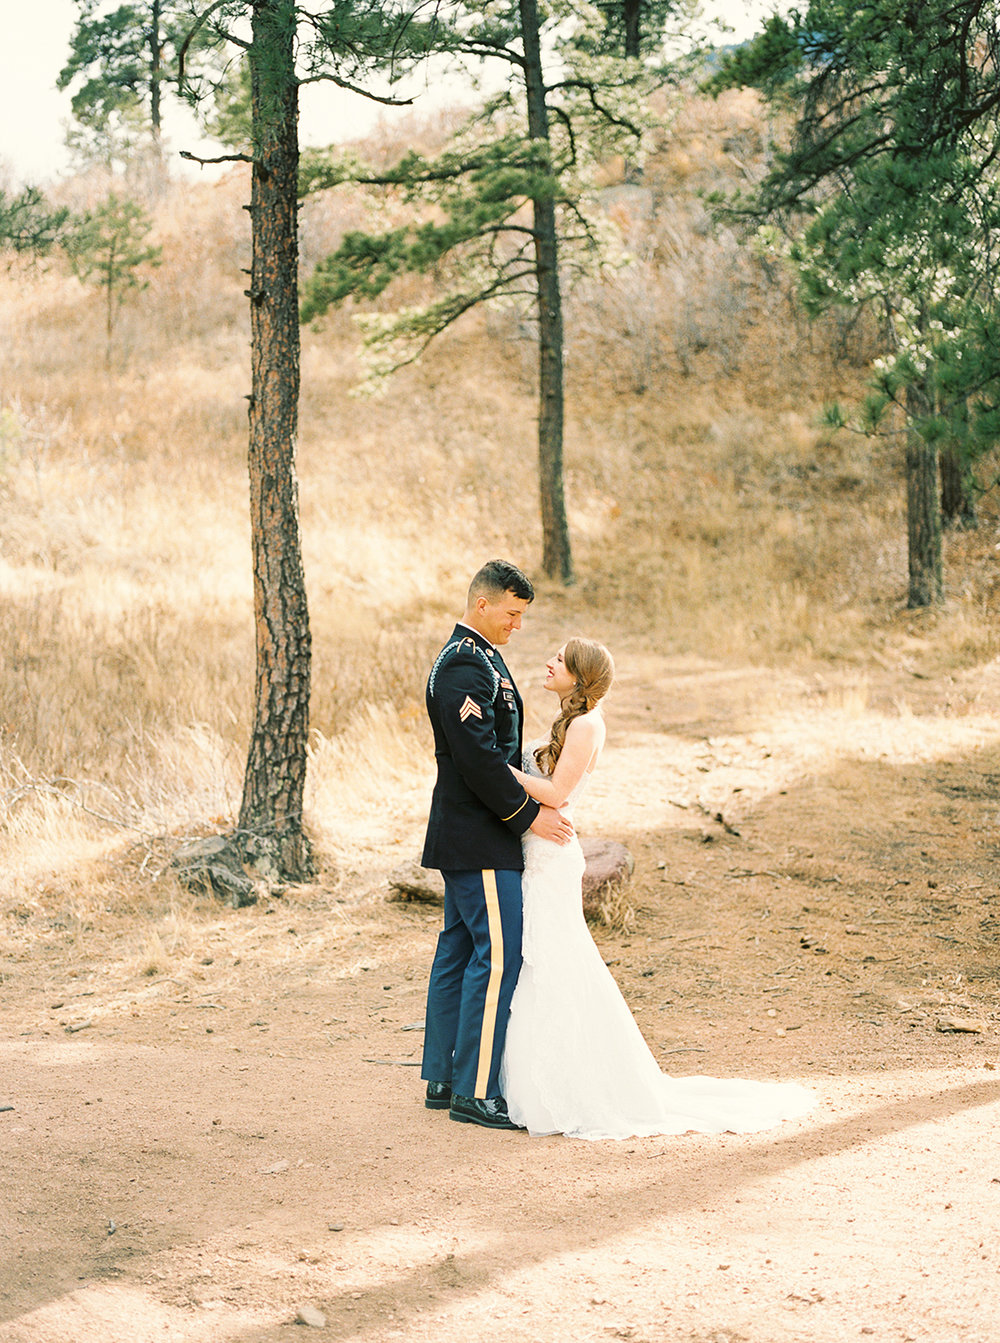 colorado-springs-military-wedding-skylar-rain-photography-j-d-6.jpg